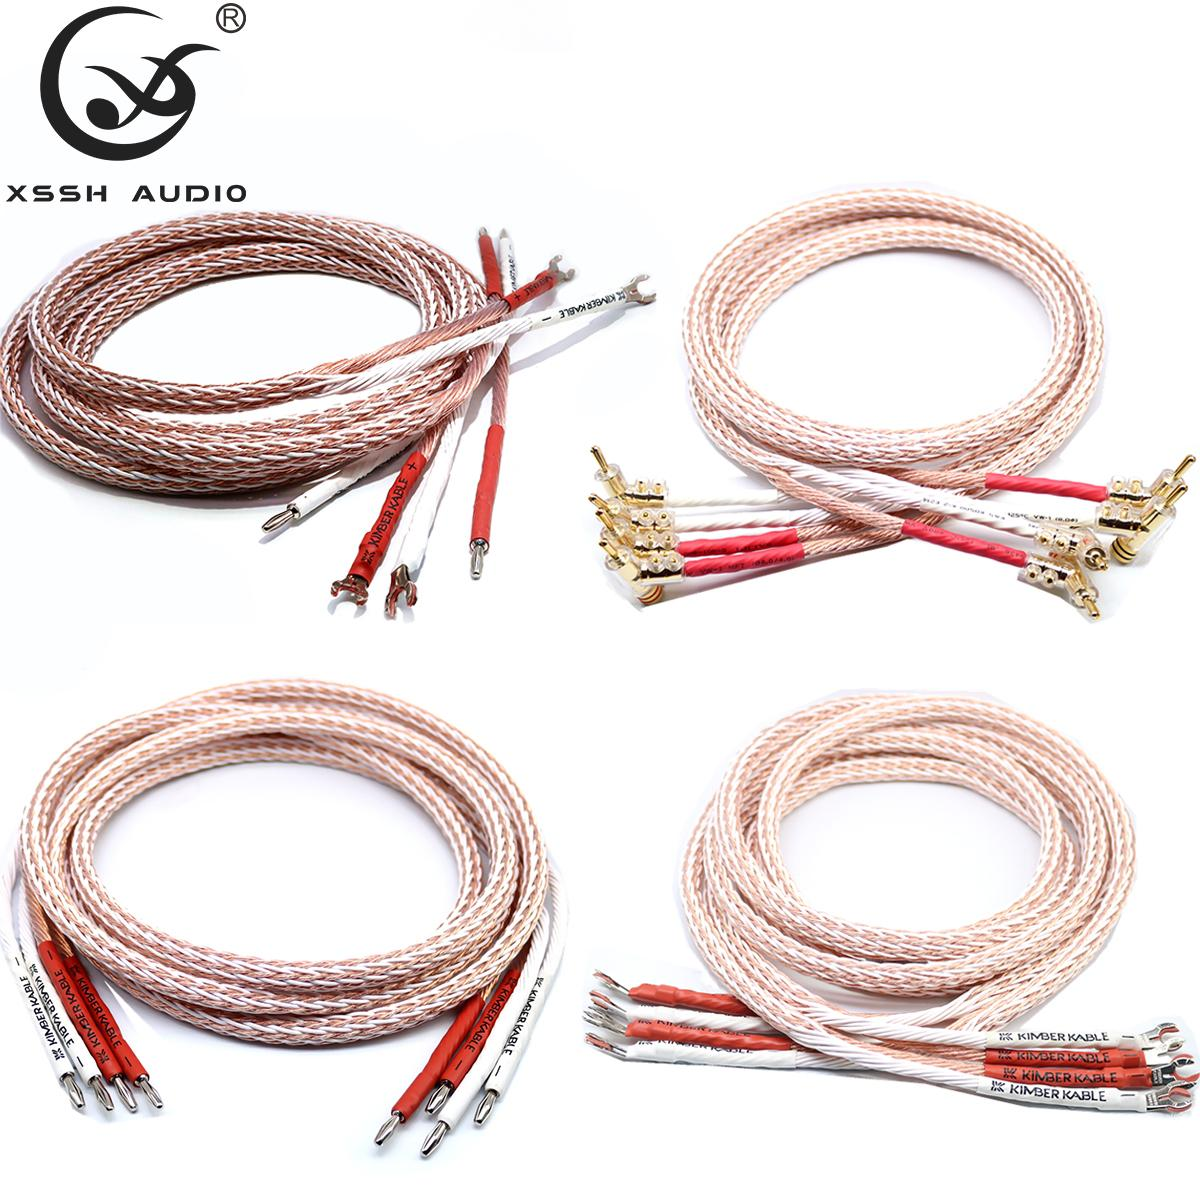 1 pair XSSH audio Hi-end DIY HIFI Gun-Type Gold Rhodium Plated Y shape spade to banana plug 12TC 24 core speaker cable Cord Wire T200608